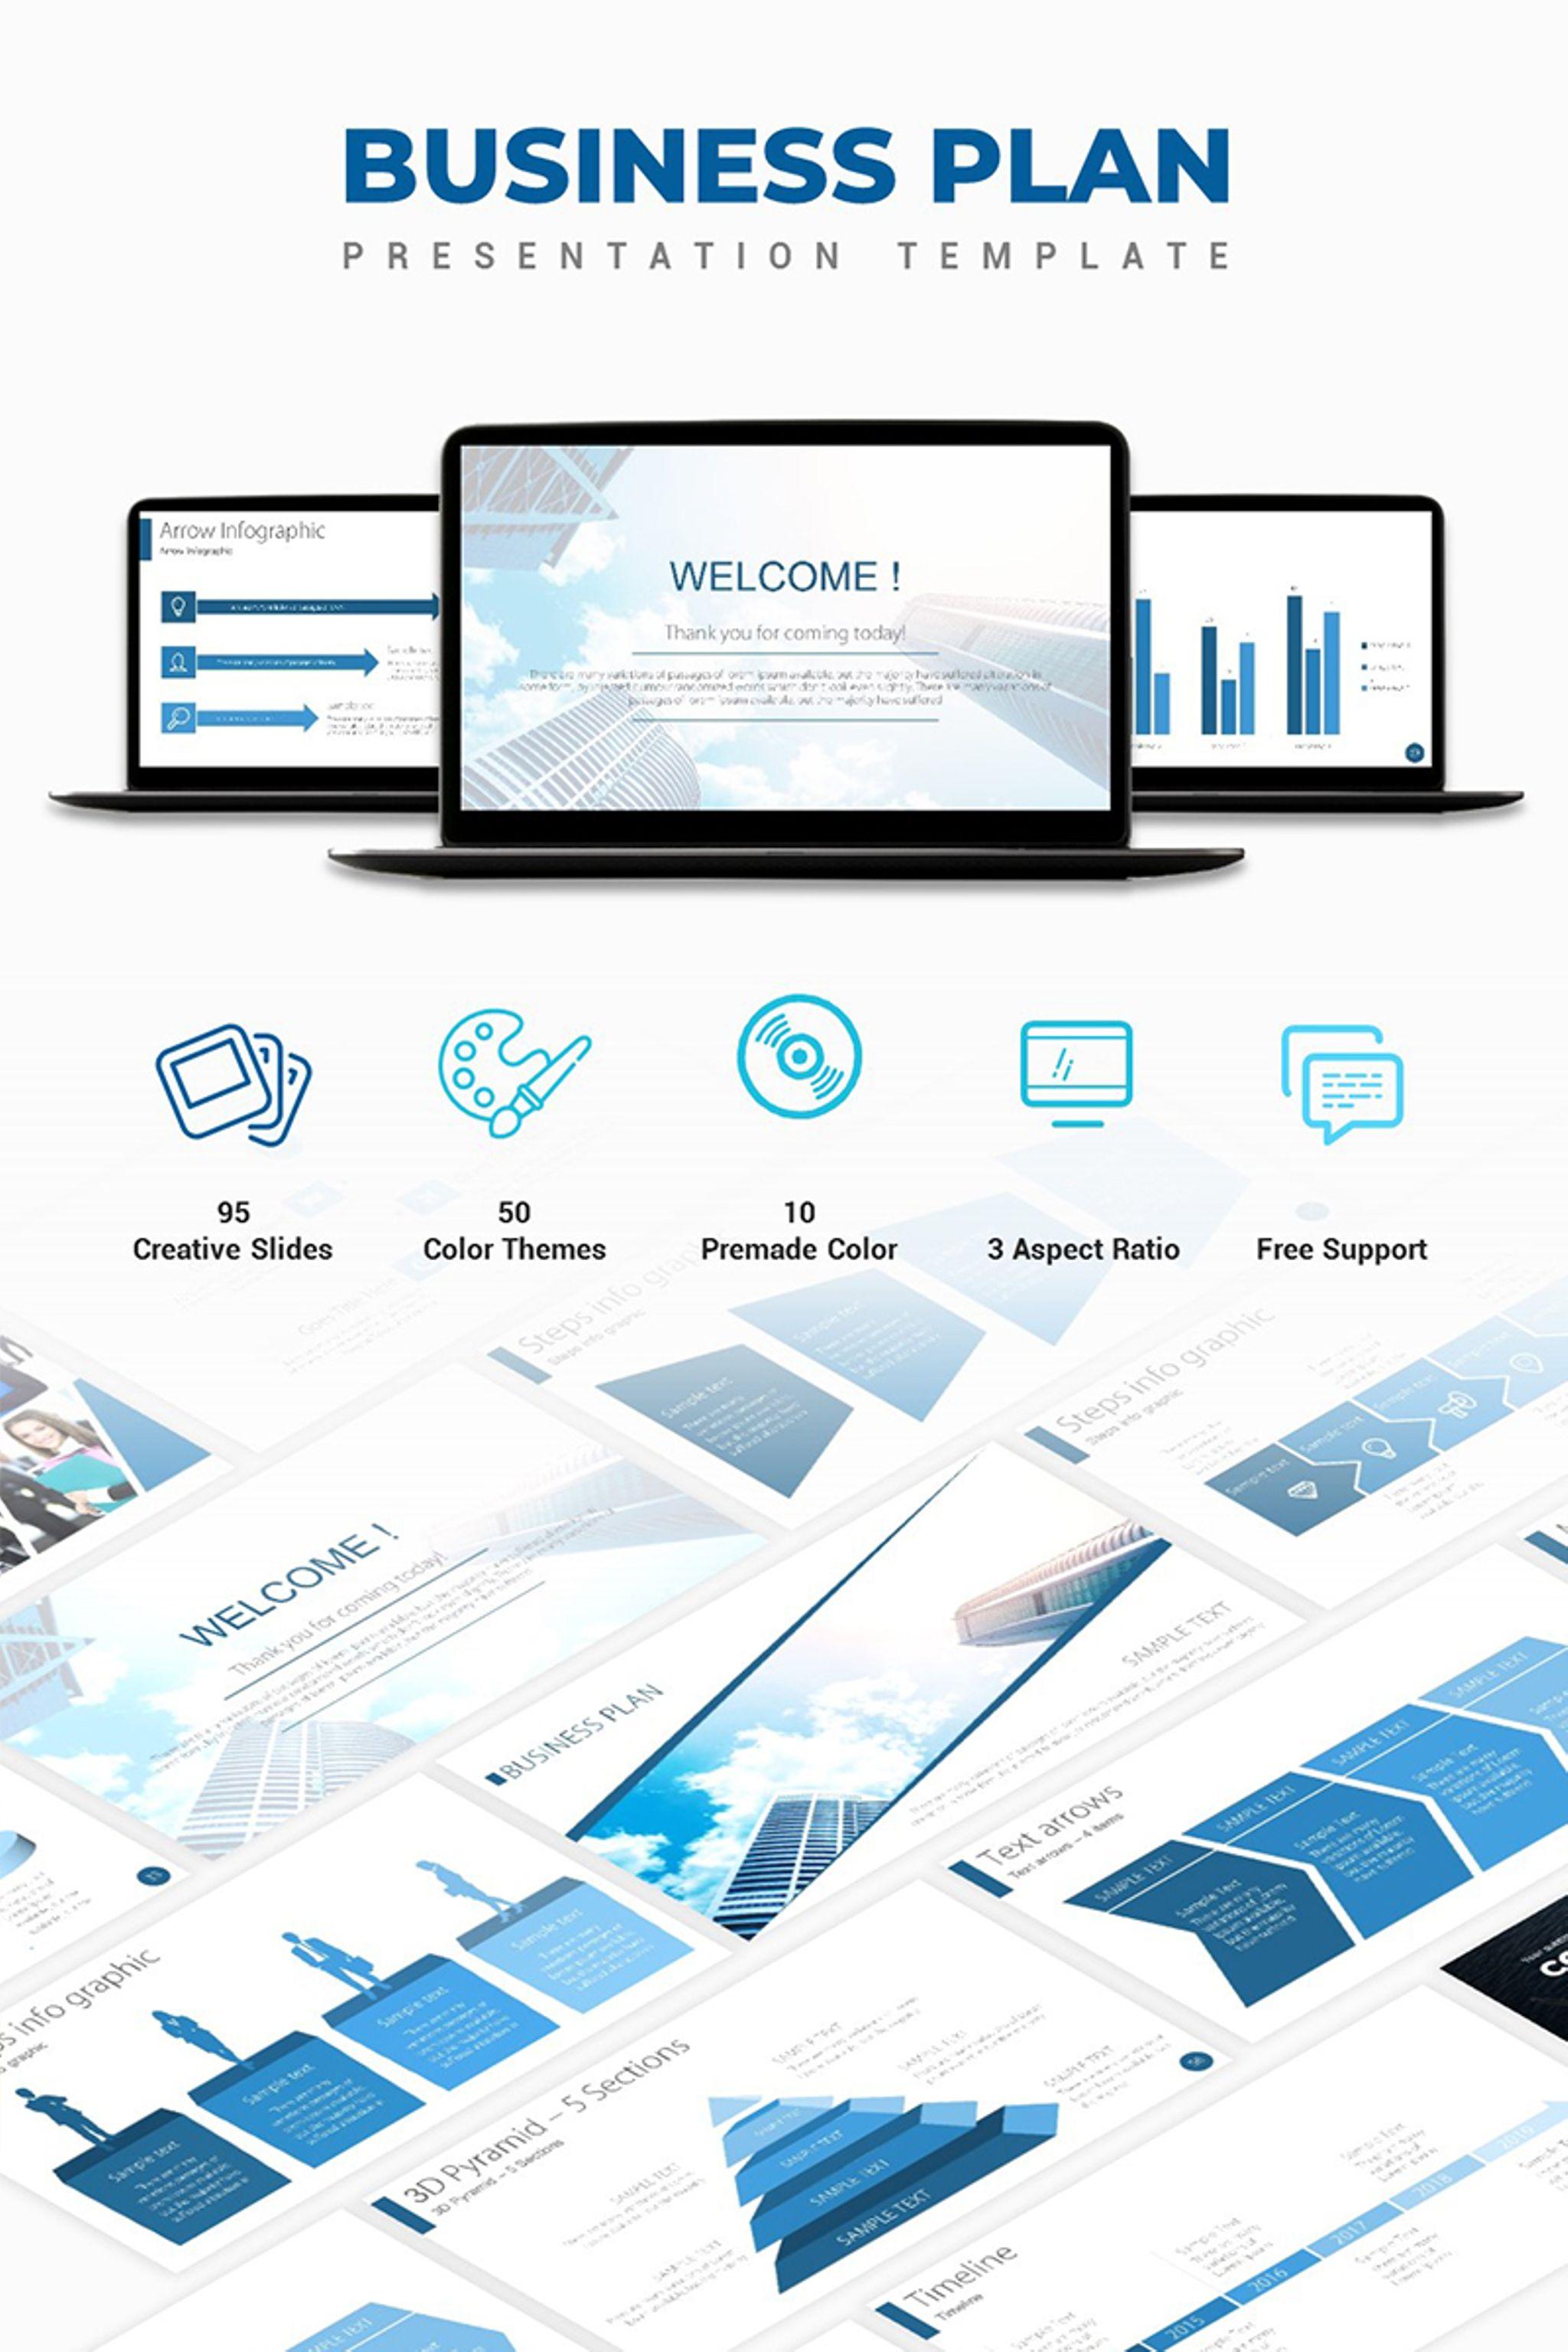 """Business Plan"" - PowerPoint шаблон №67200"